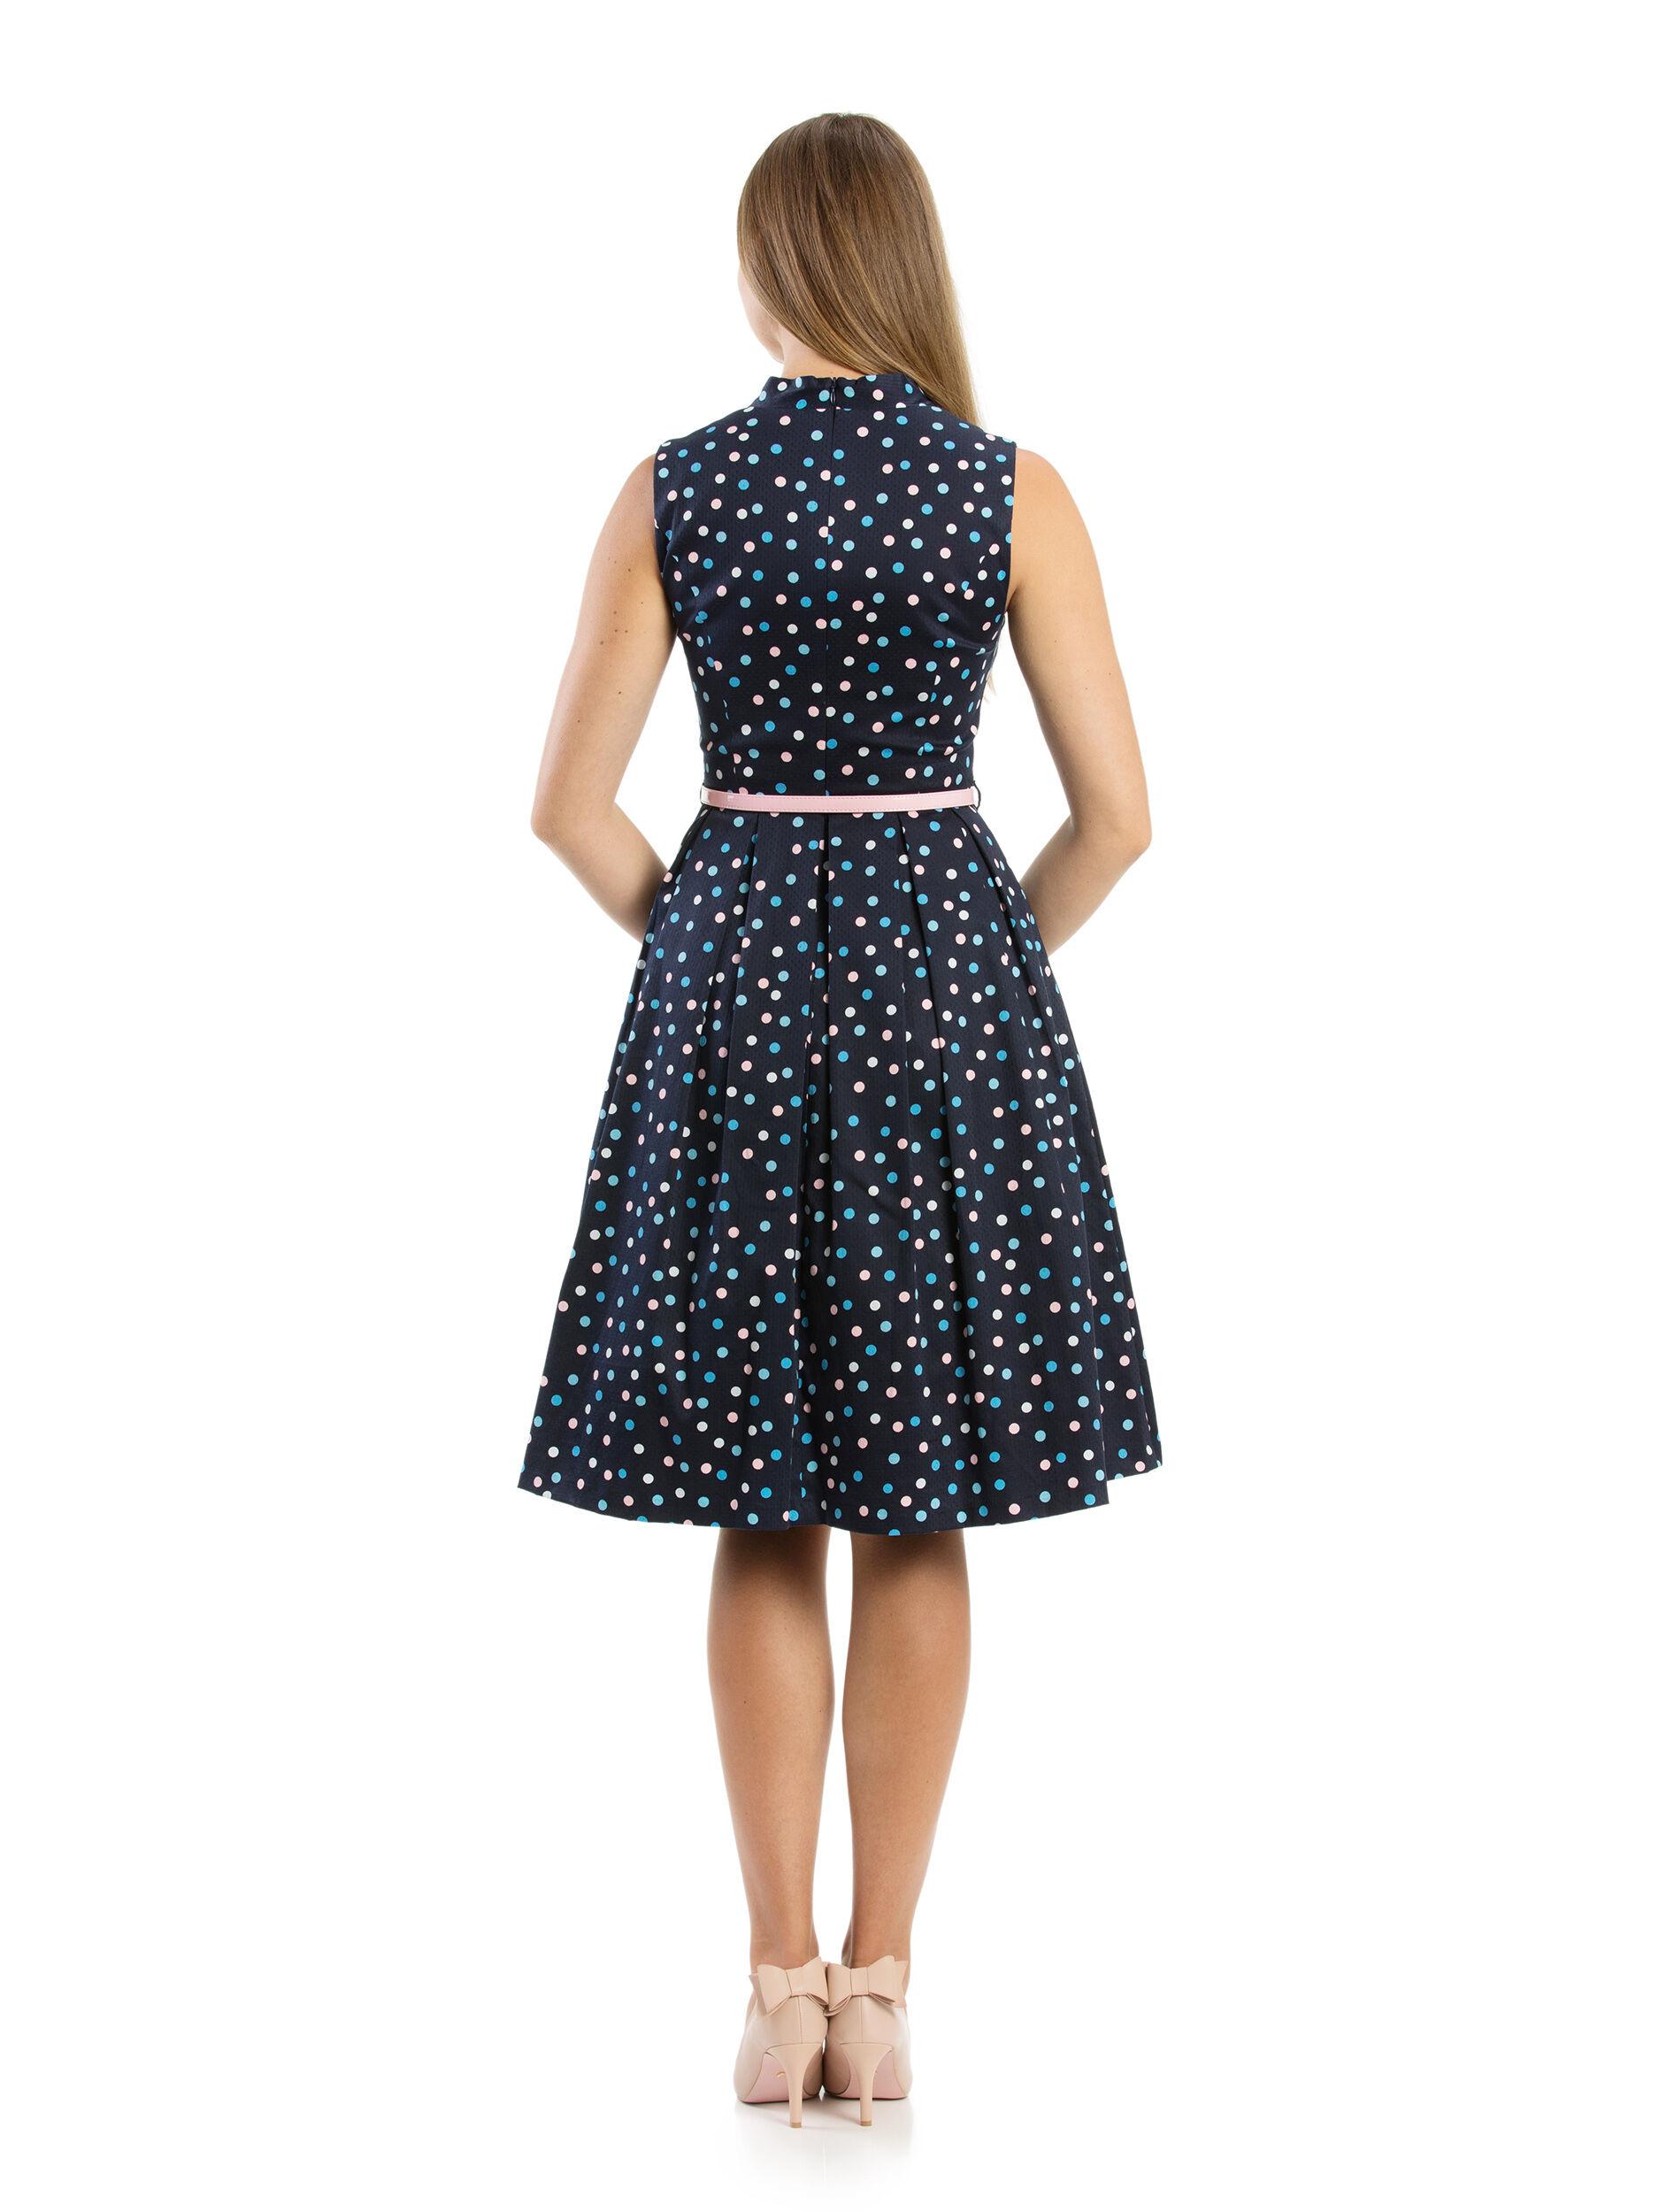 Orion Spot Dress